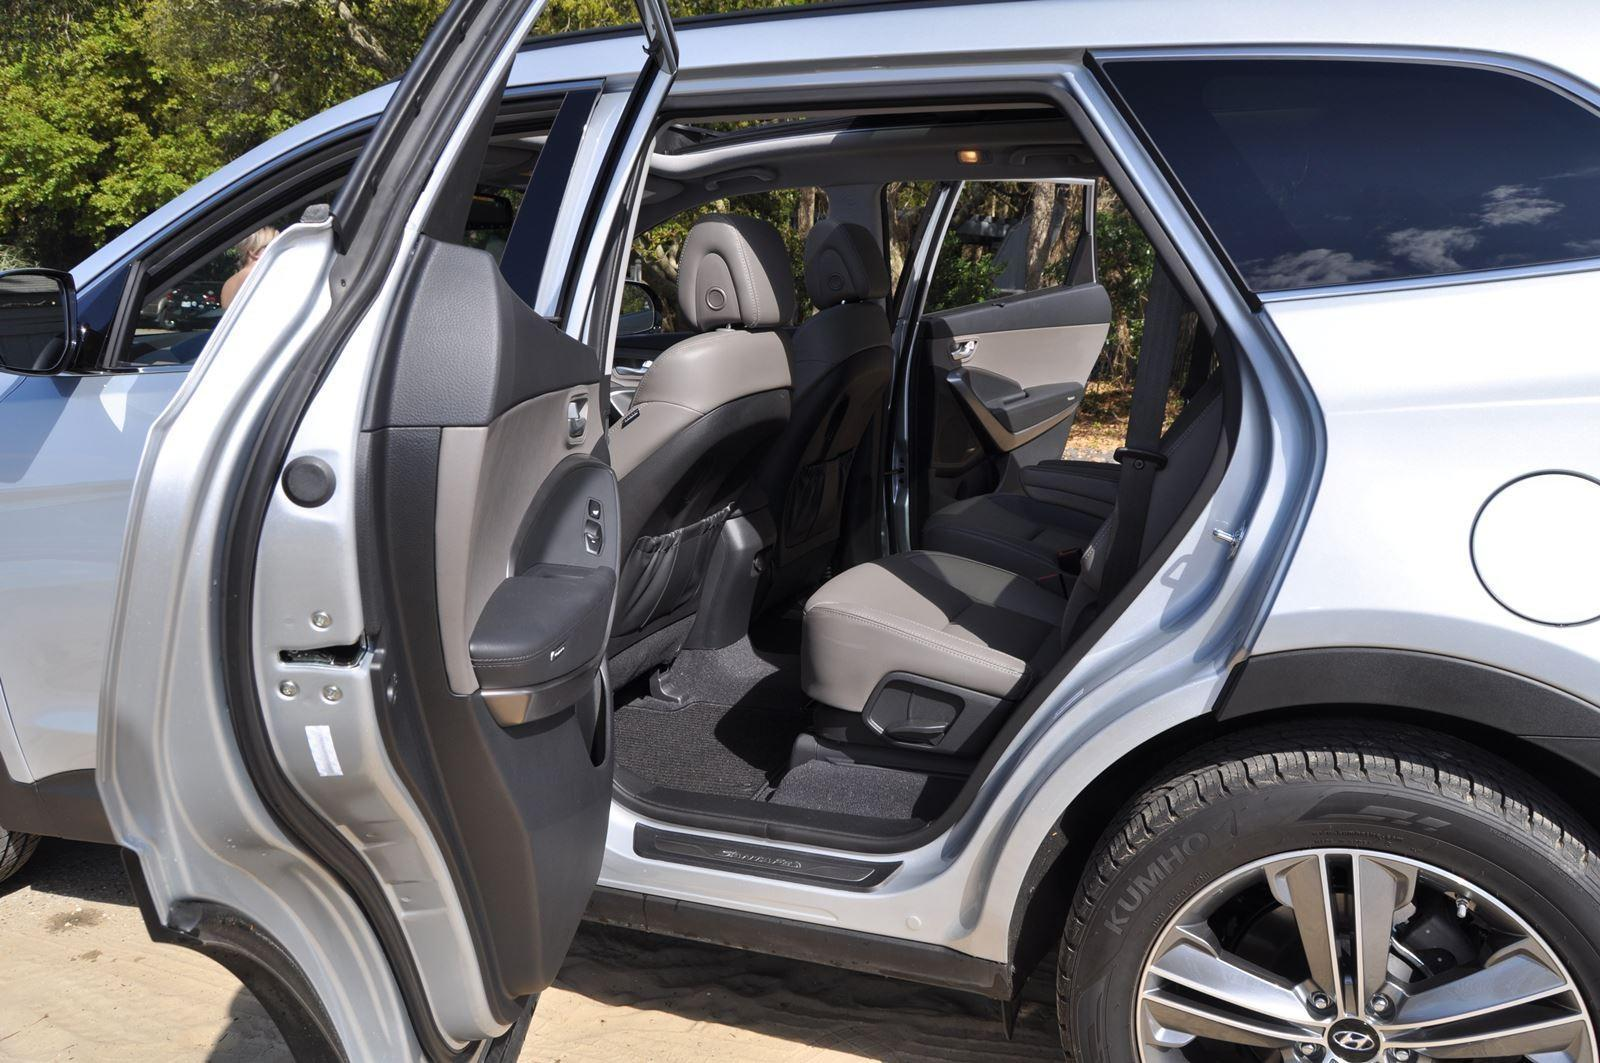 2015 Hyundai Santa Fe LWB Ultimate - Interior Photos 1